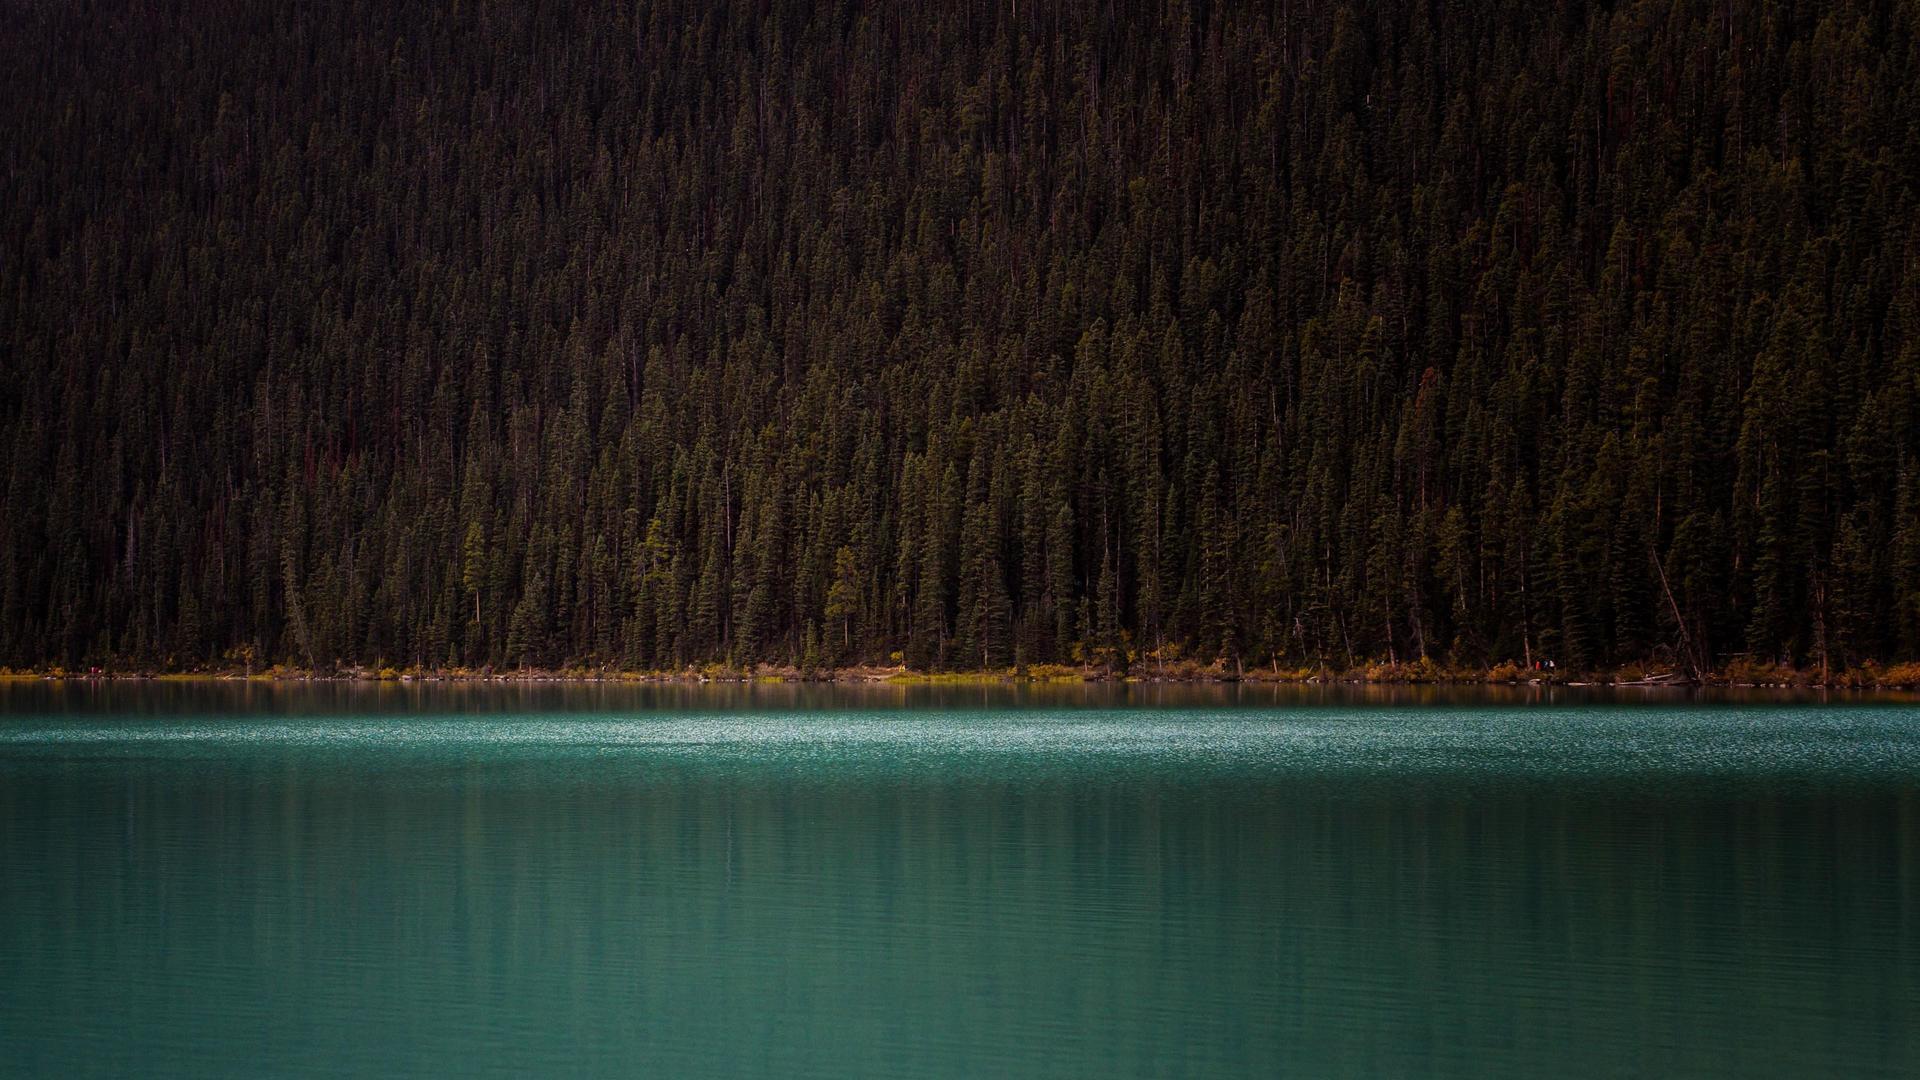 Лесной берег озеро лес вода